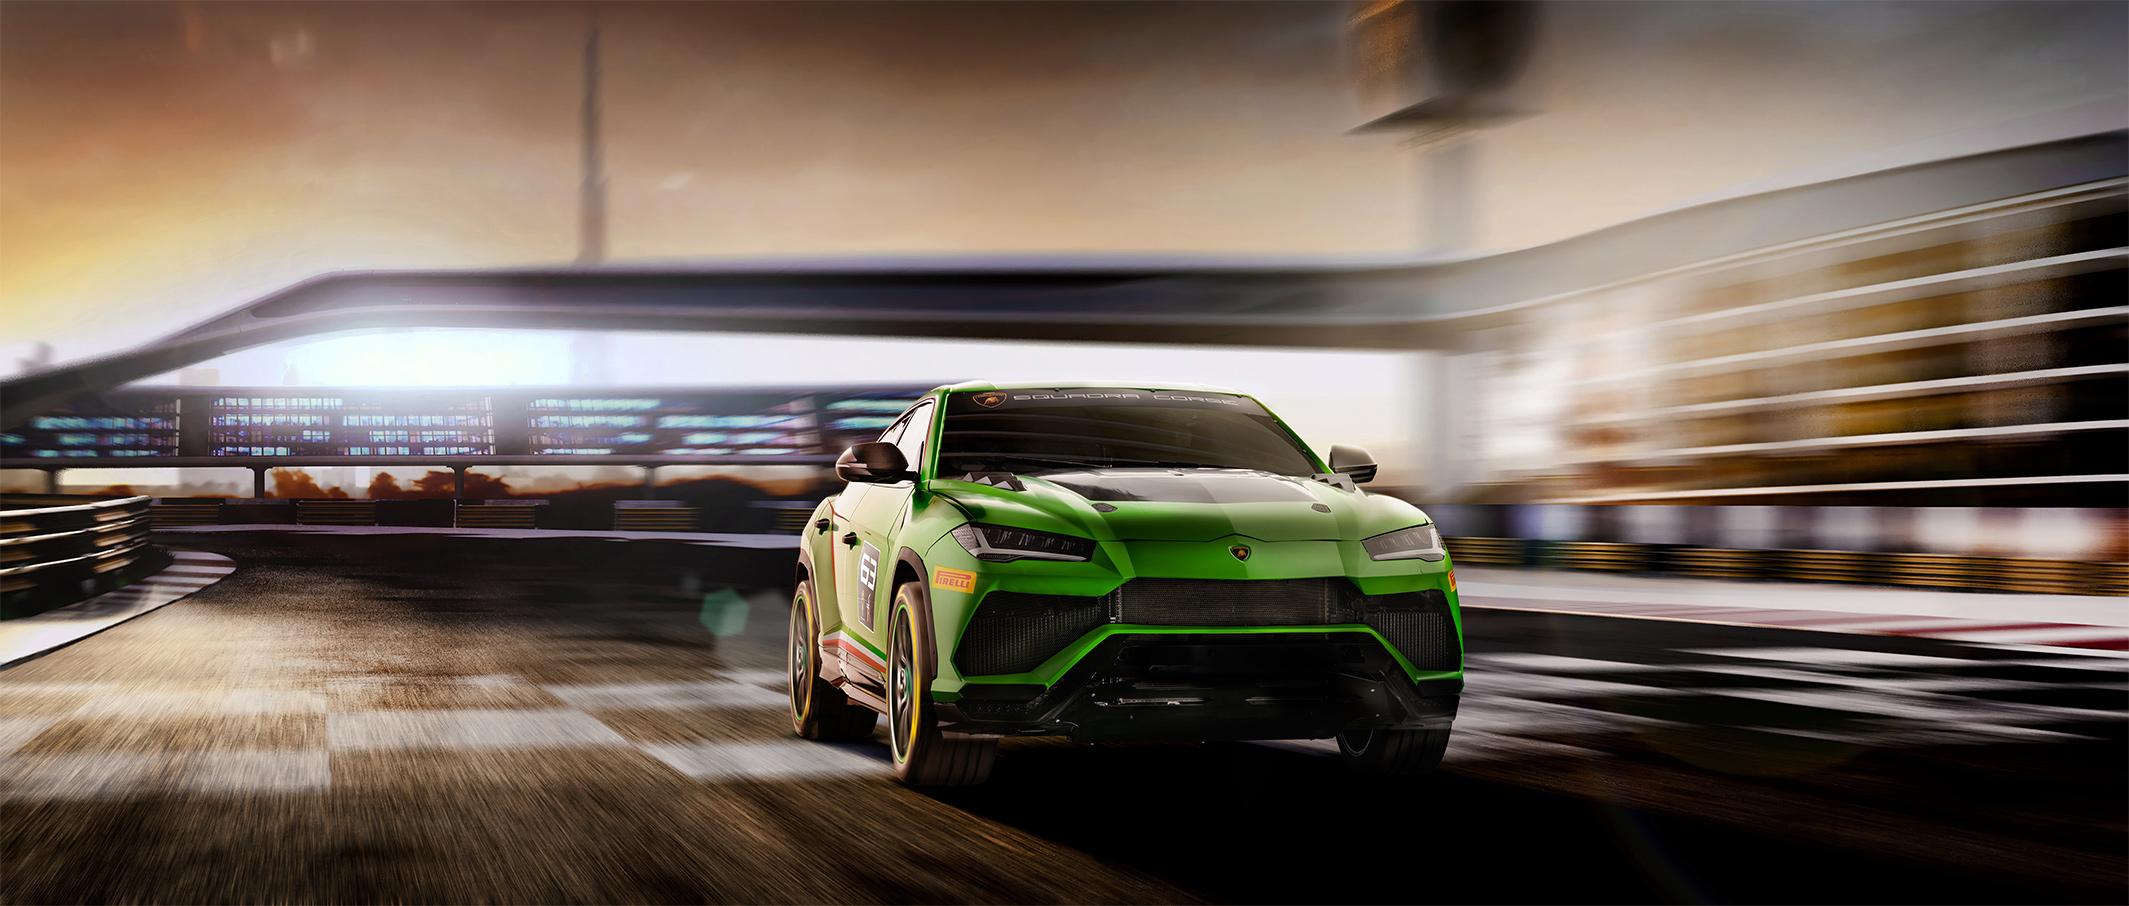 TrackWorthy - Lamborghini Urus ST-X Concept (5)